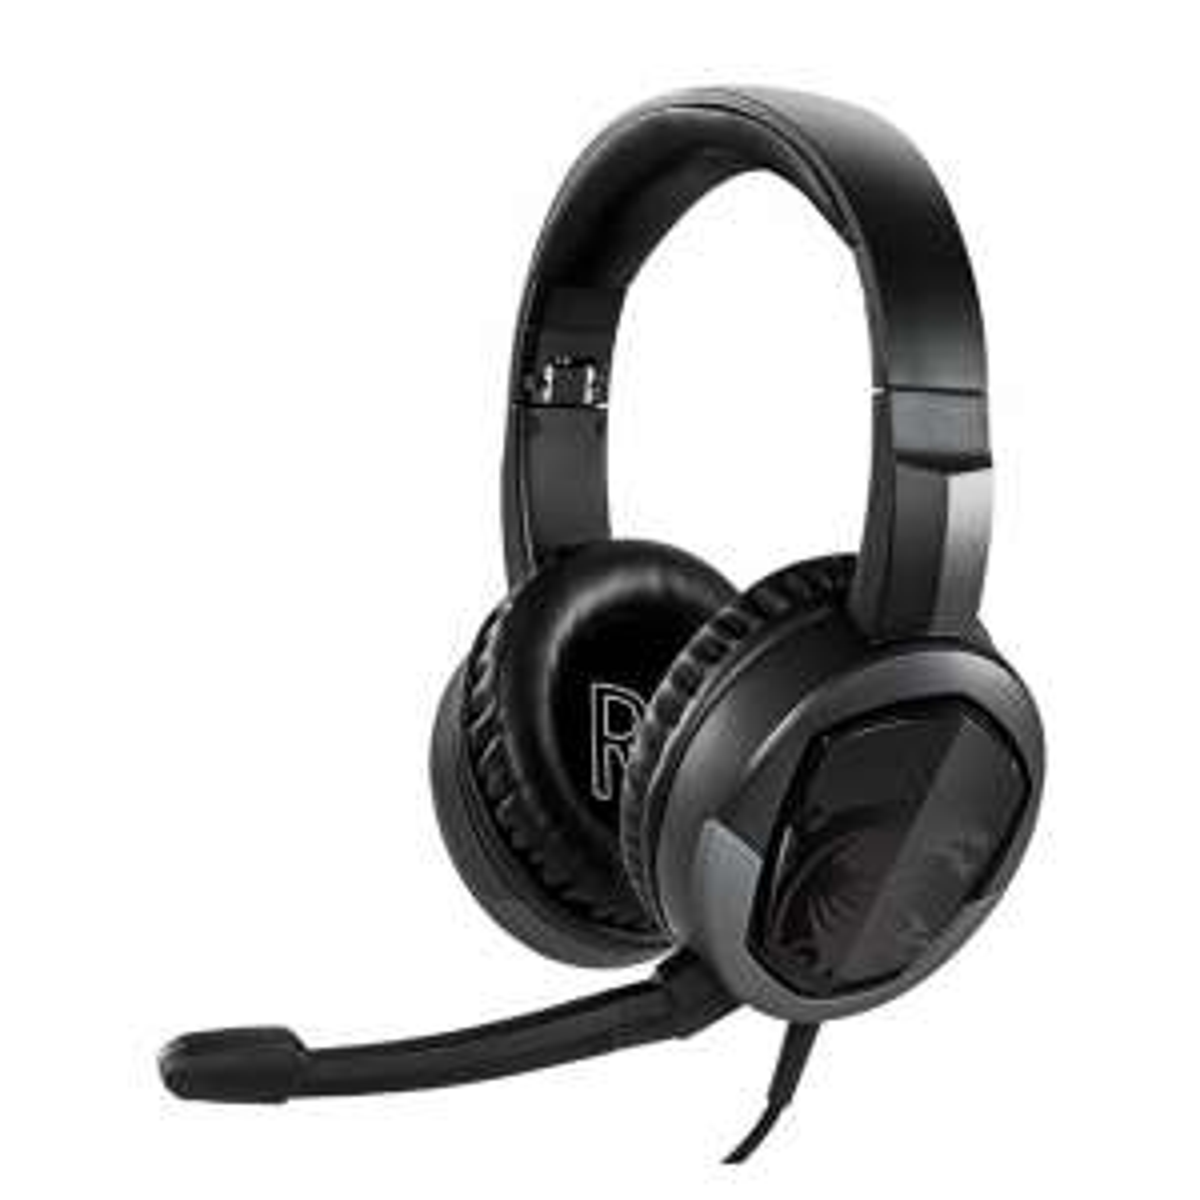 MSI Immerse GH30 V2 Gaming-Kopfhörer, faltbar, mit Mikrofon